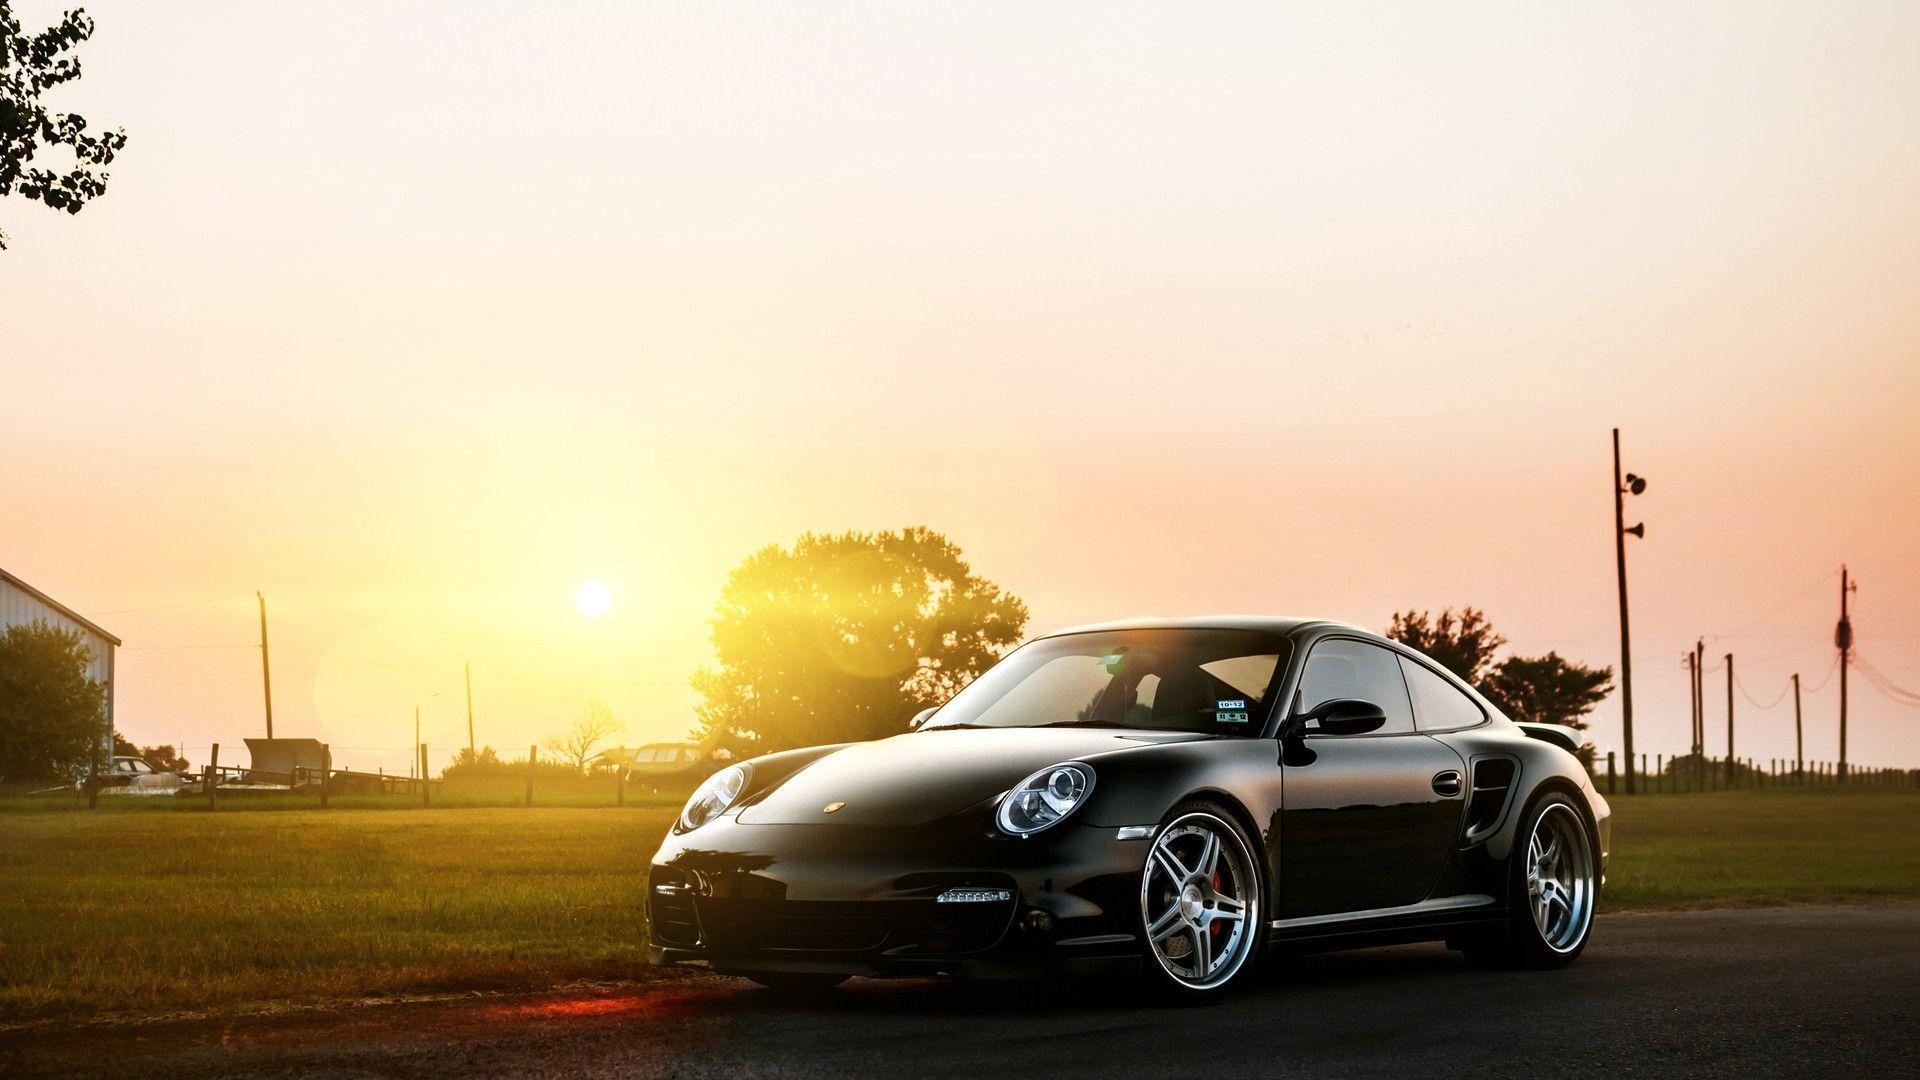 Porsche Panamera 911  № 2369986 загрузить